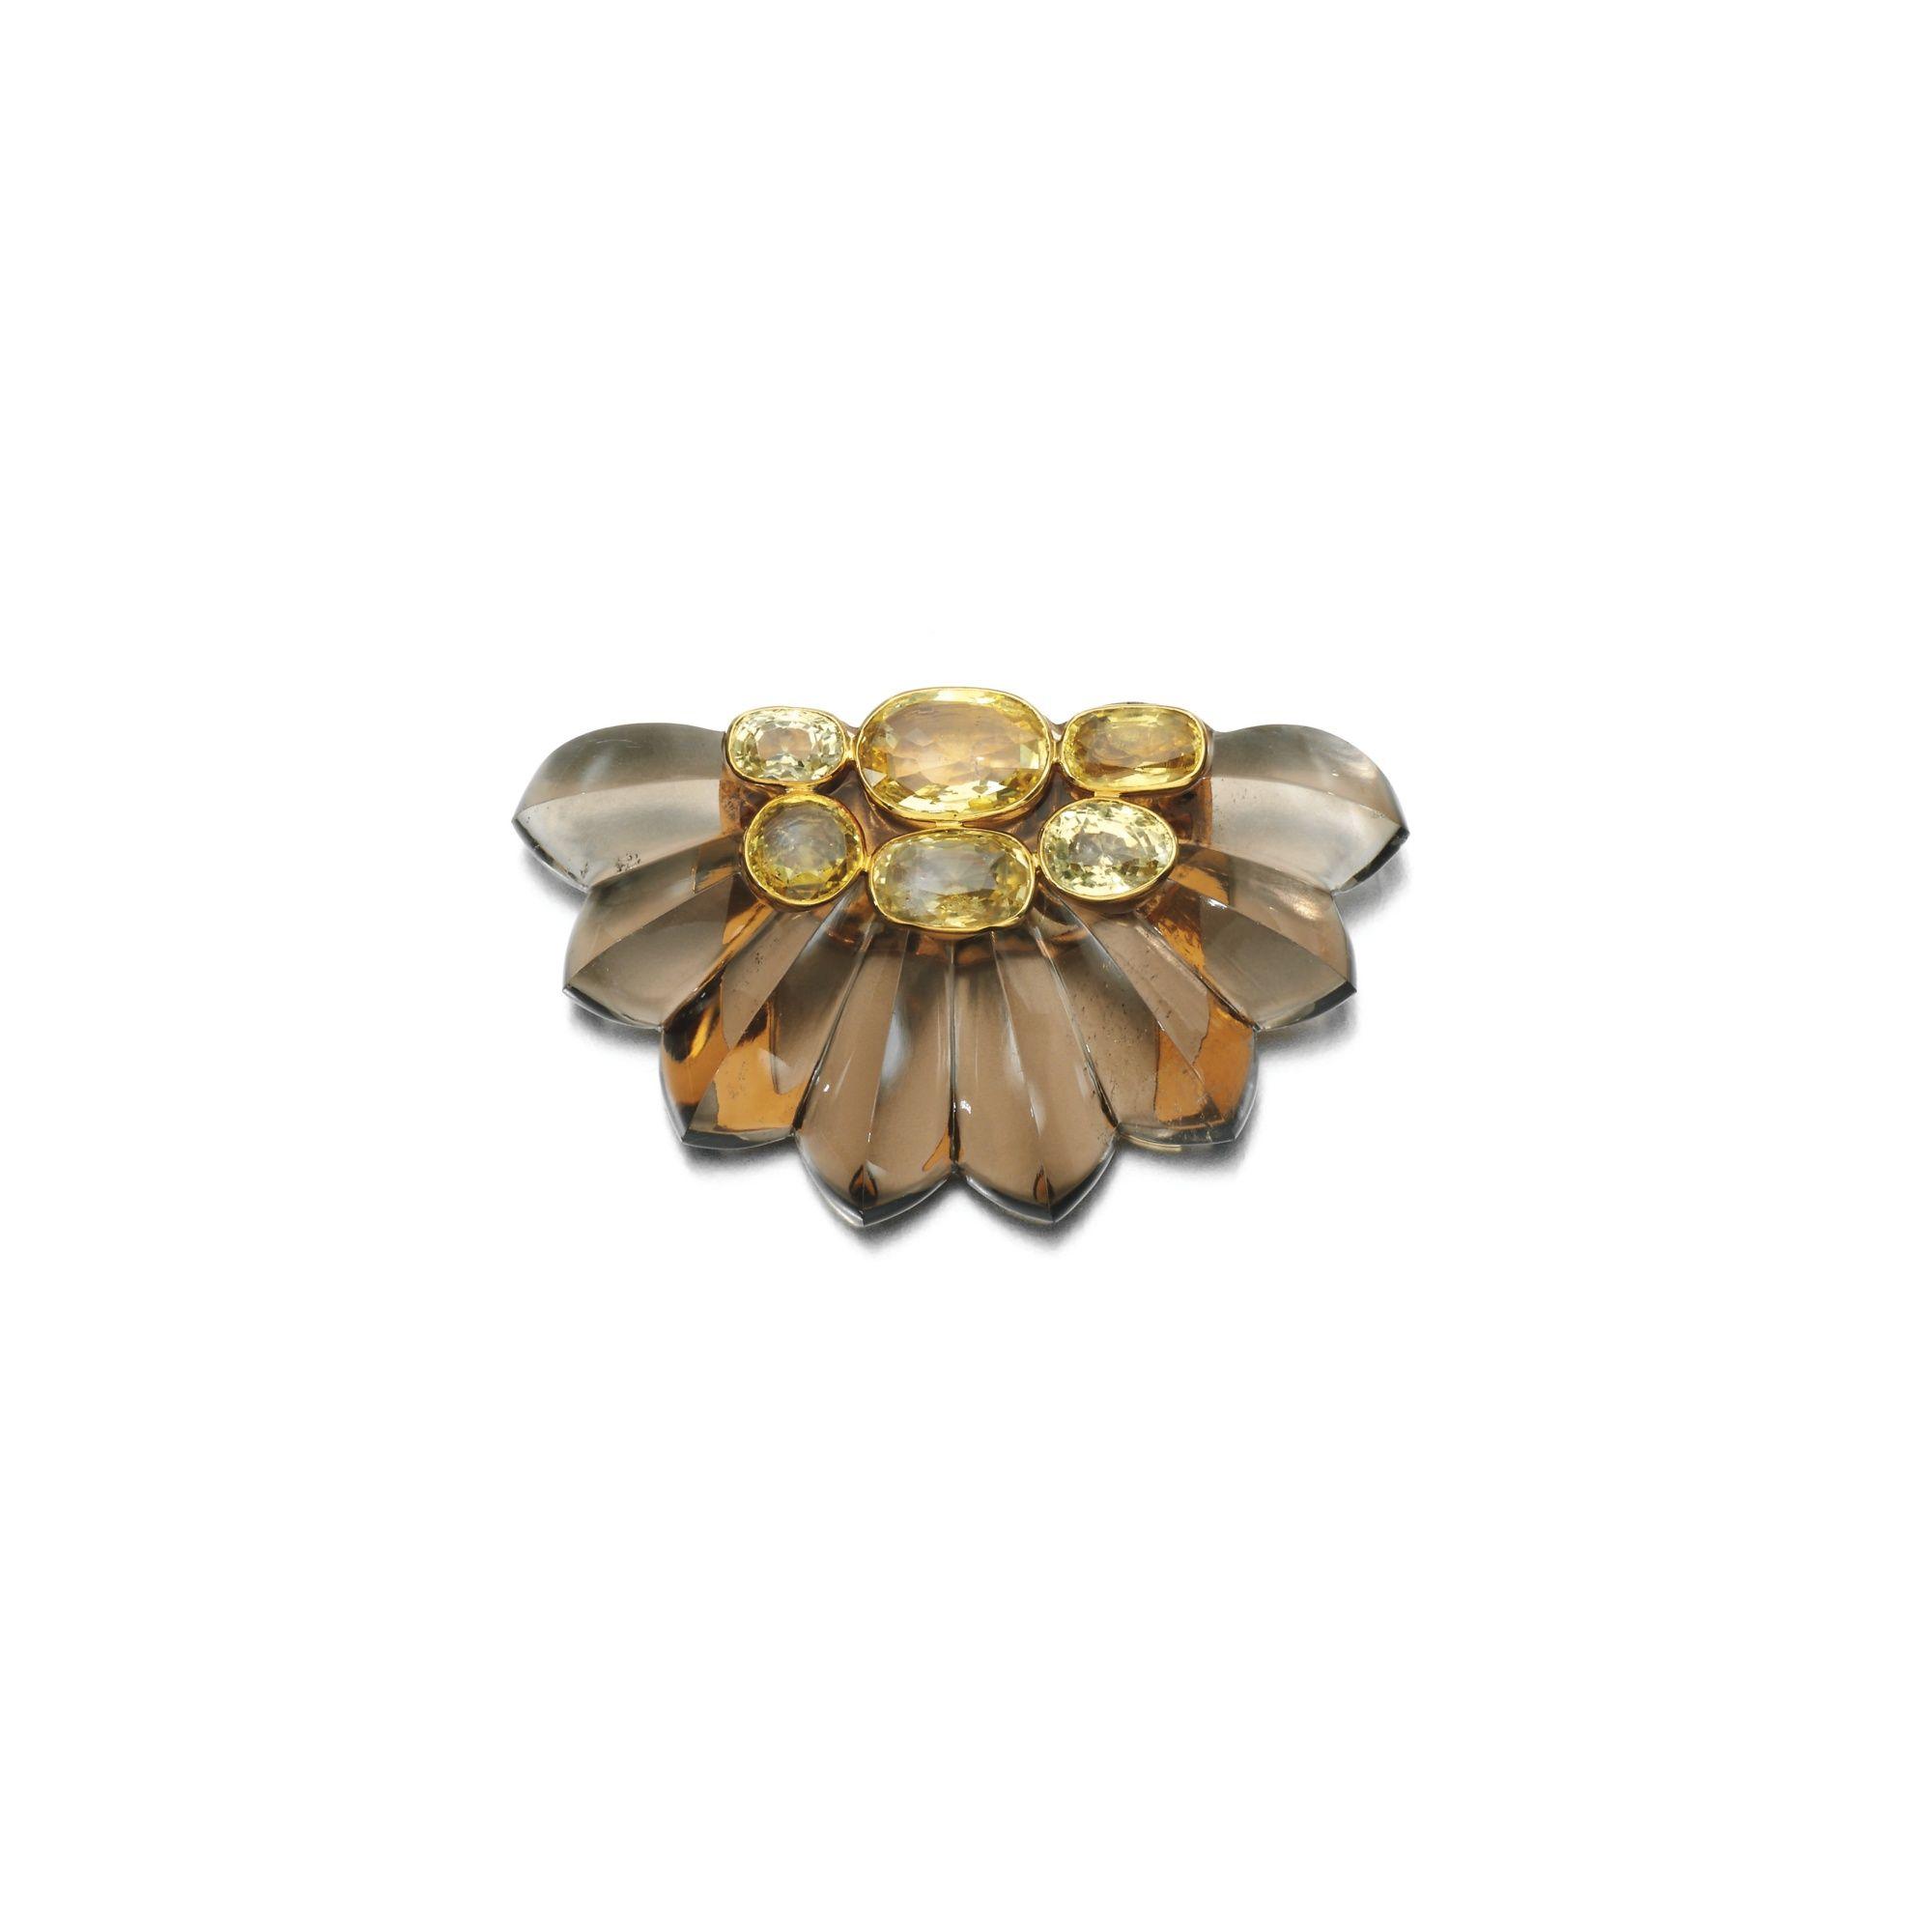 -Smoky quartz, yellow sapphire and citrine brooch, Suzanne Belperron, circa 1935